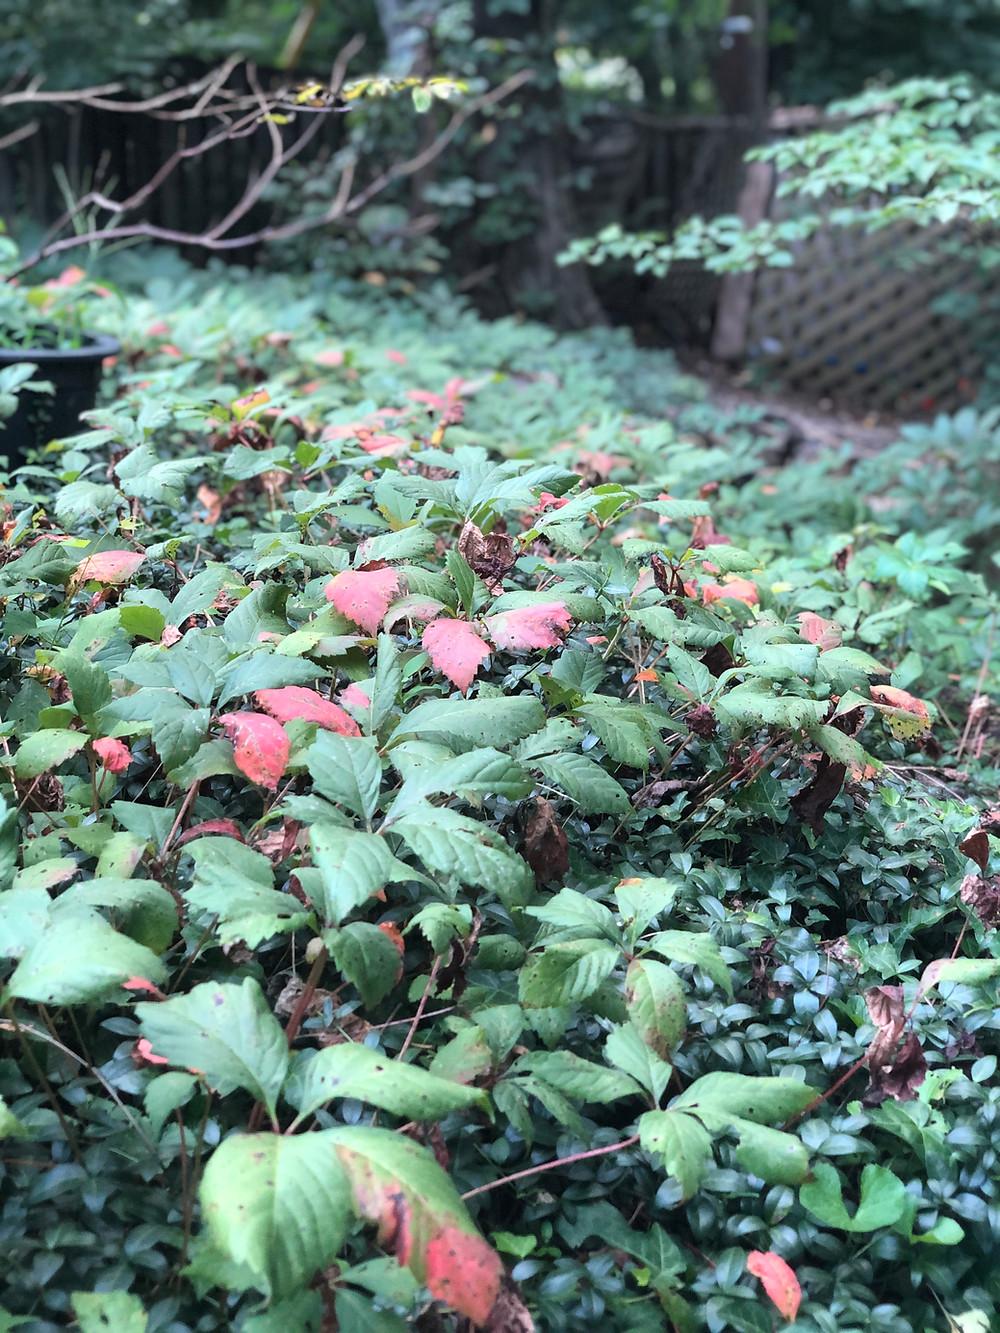 virginia creeper growing over vinca